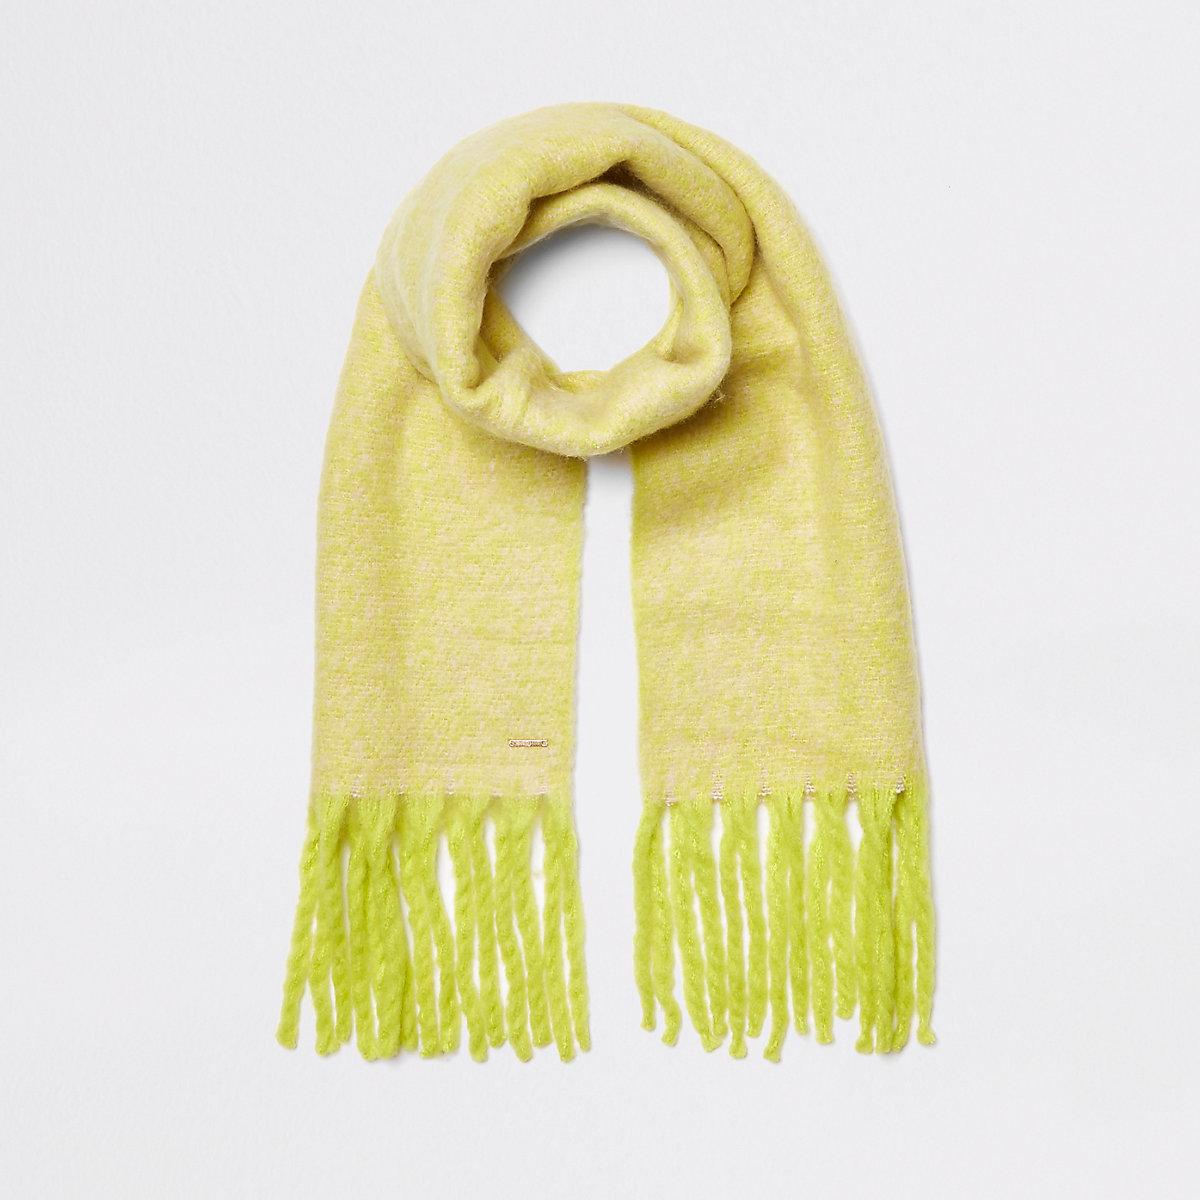 Neon yellow marl fluffy scarf